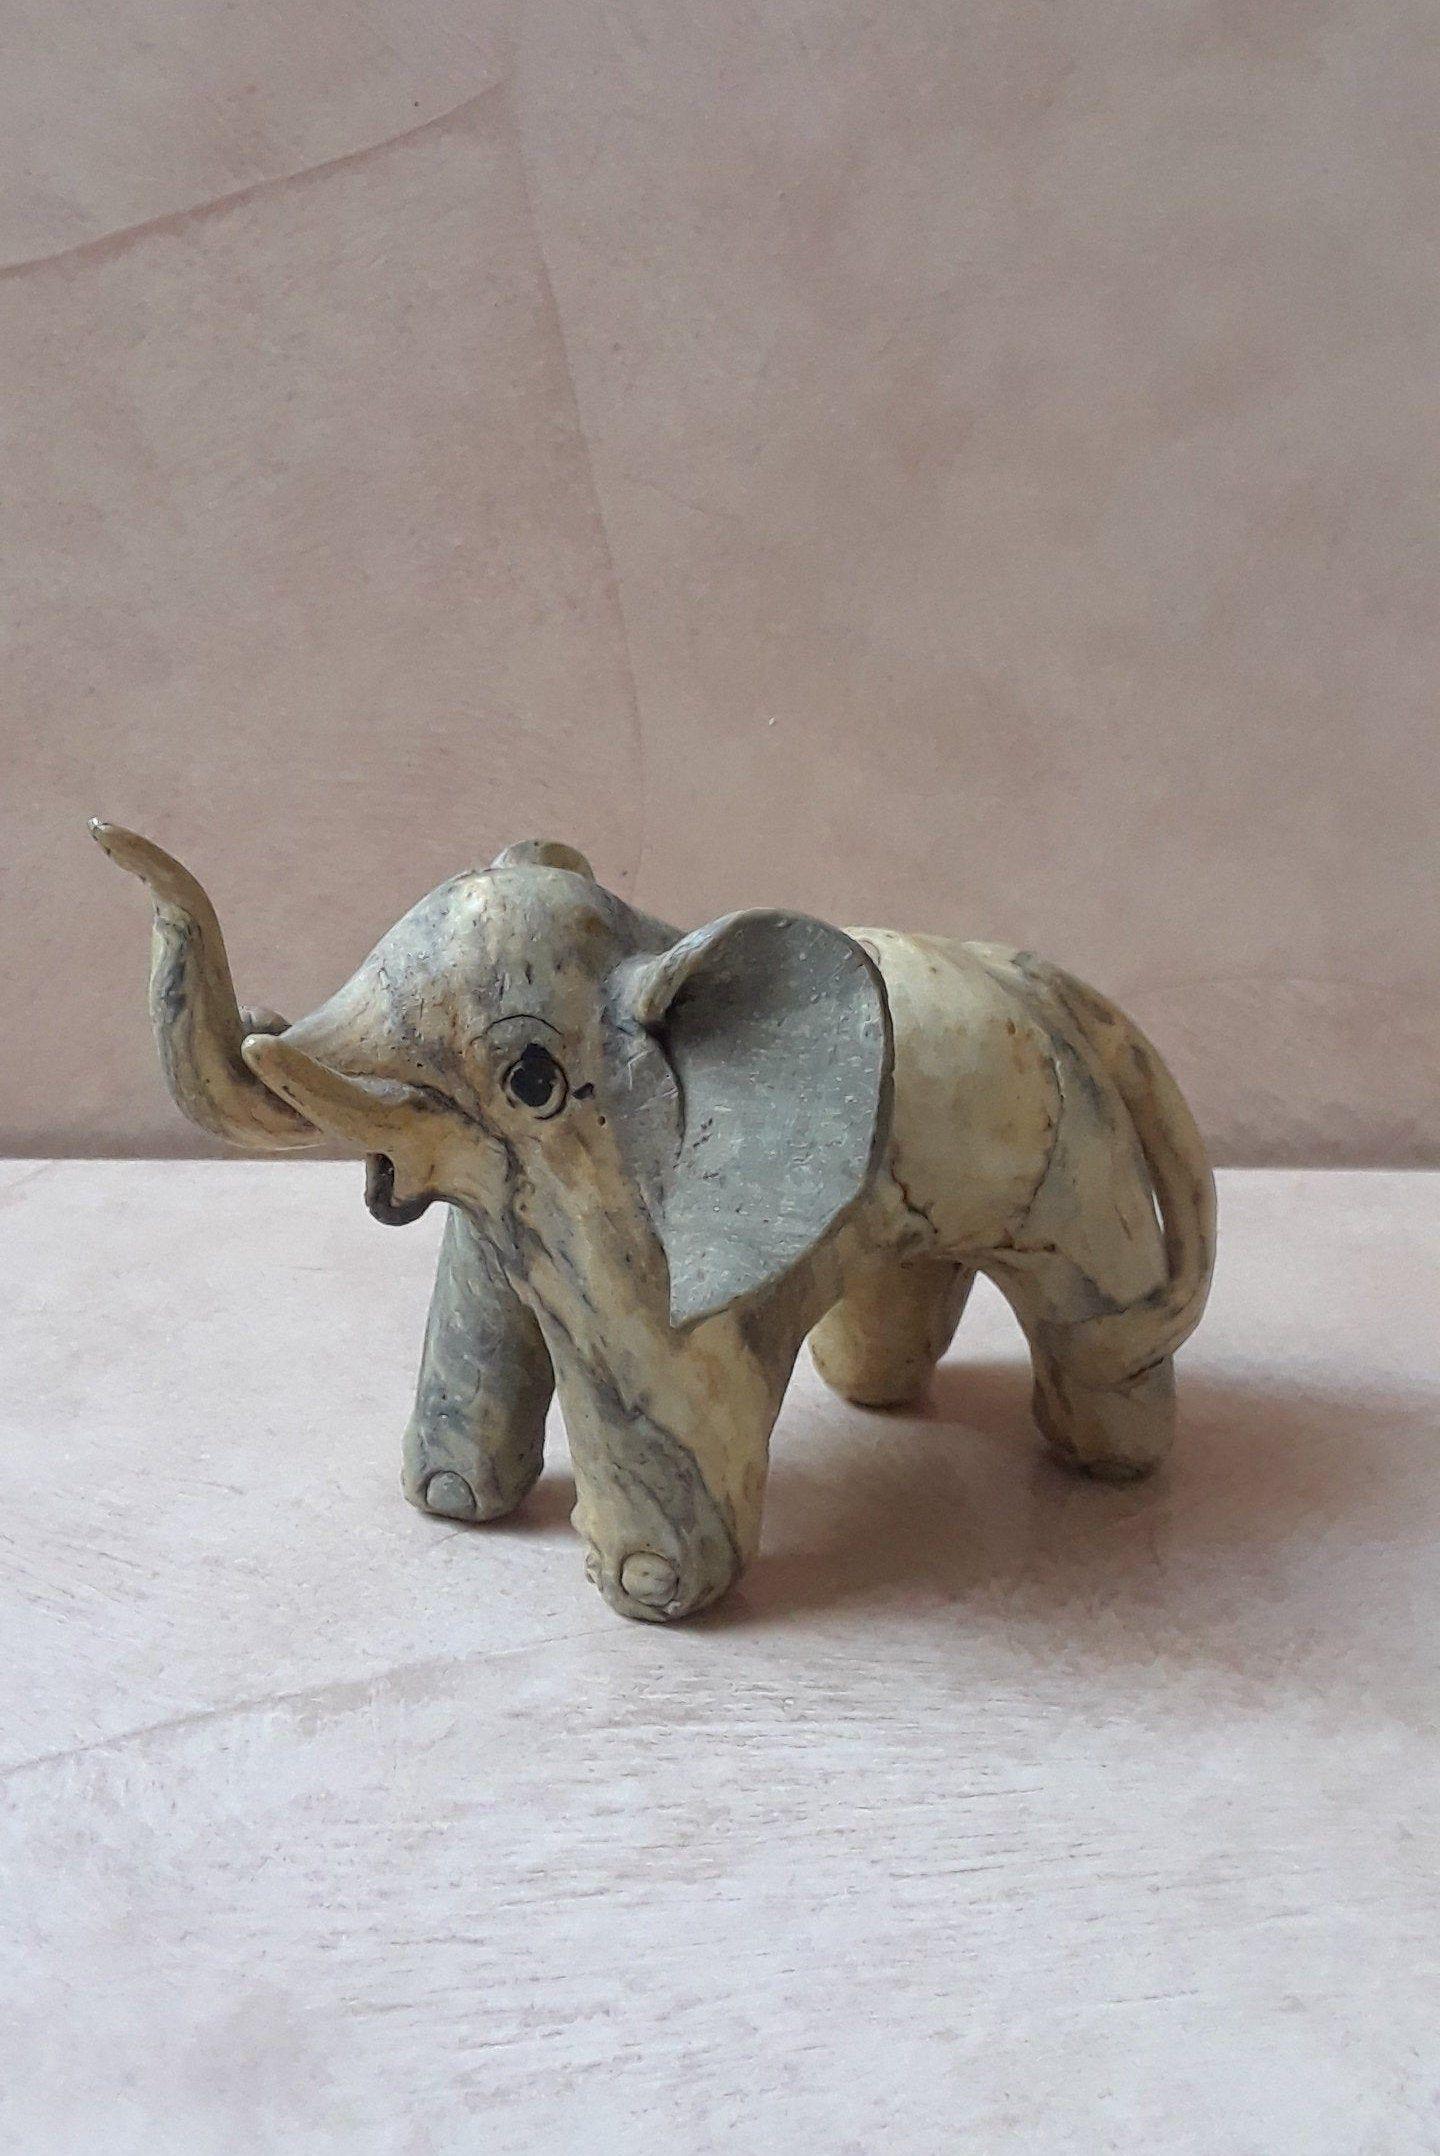 Vintage Carved Elephant With Raised Trunk For Good Luck Bone Elephant Figurines Elephant Sculpture Elephant